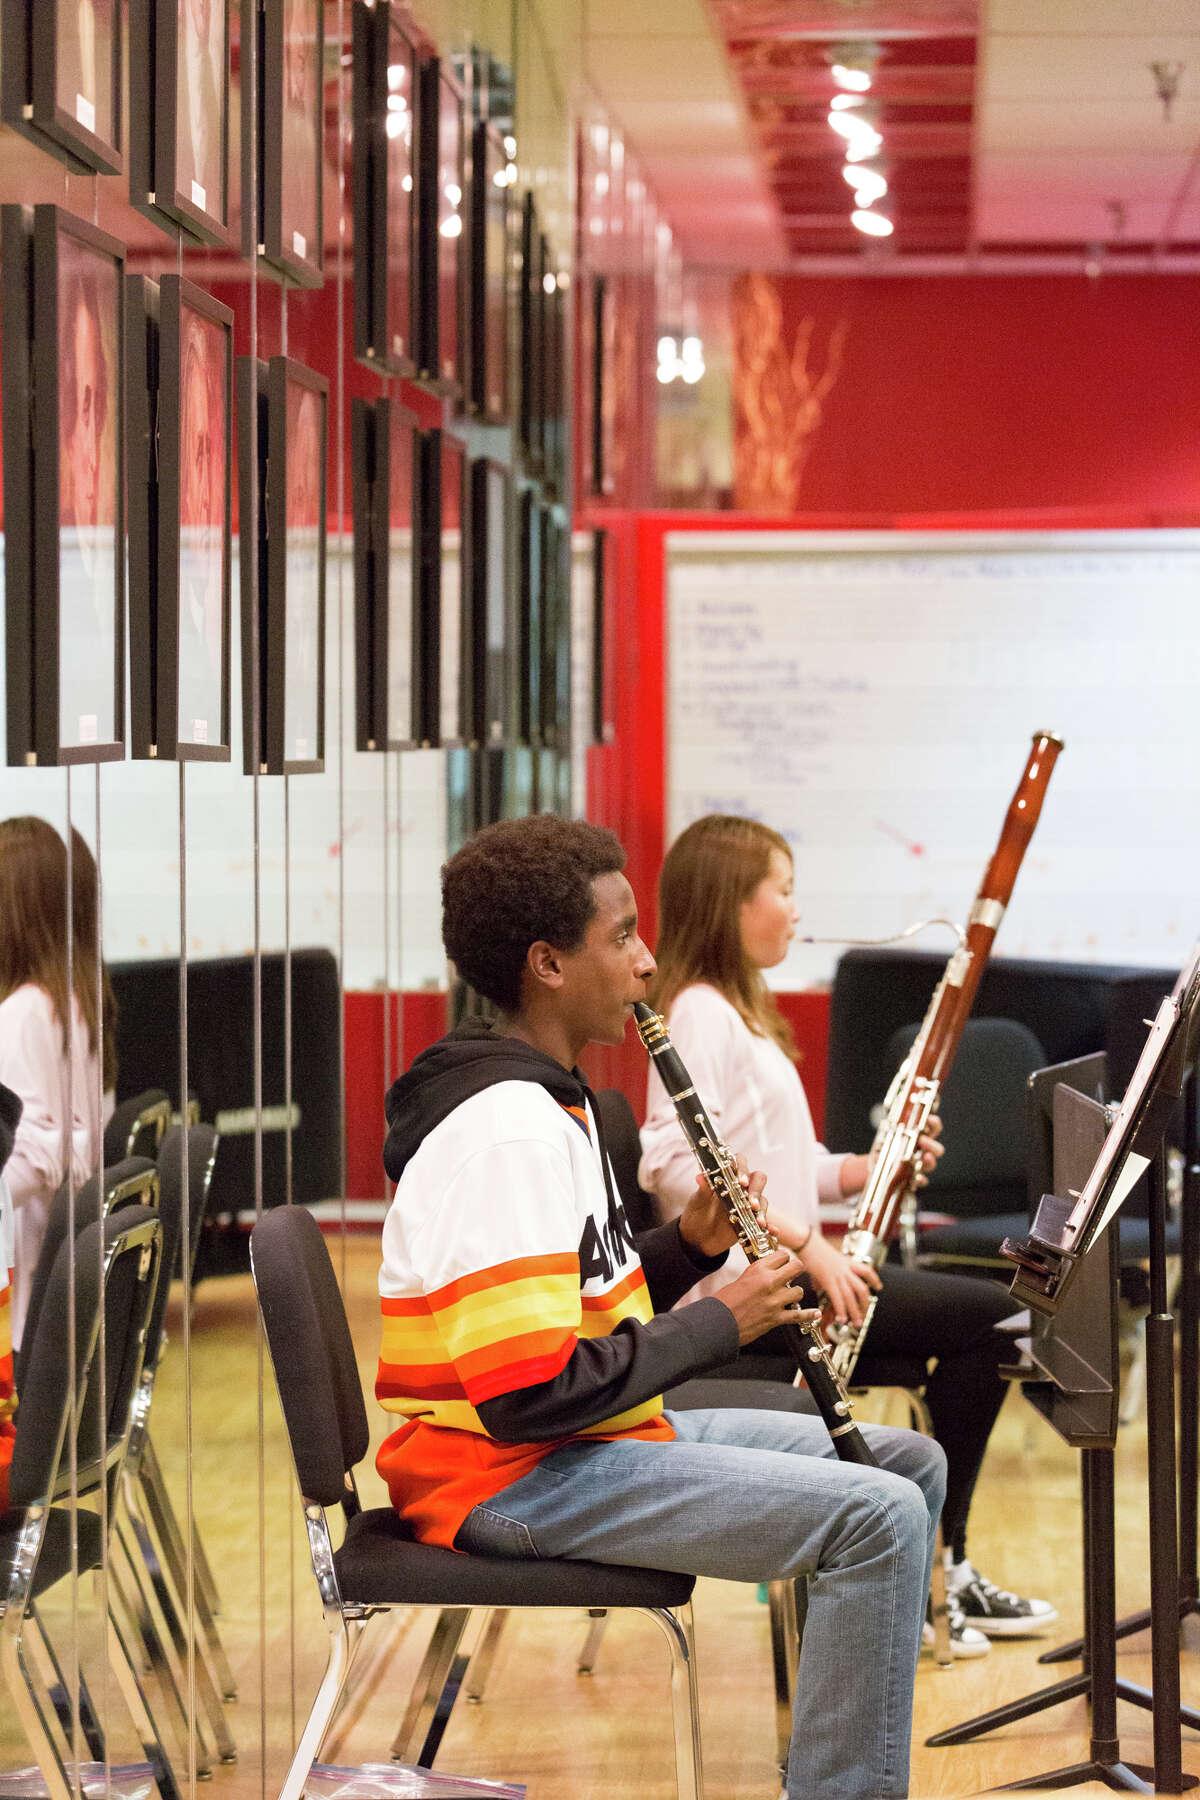 Virtuosi students rehearsing.